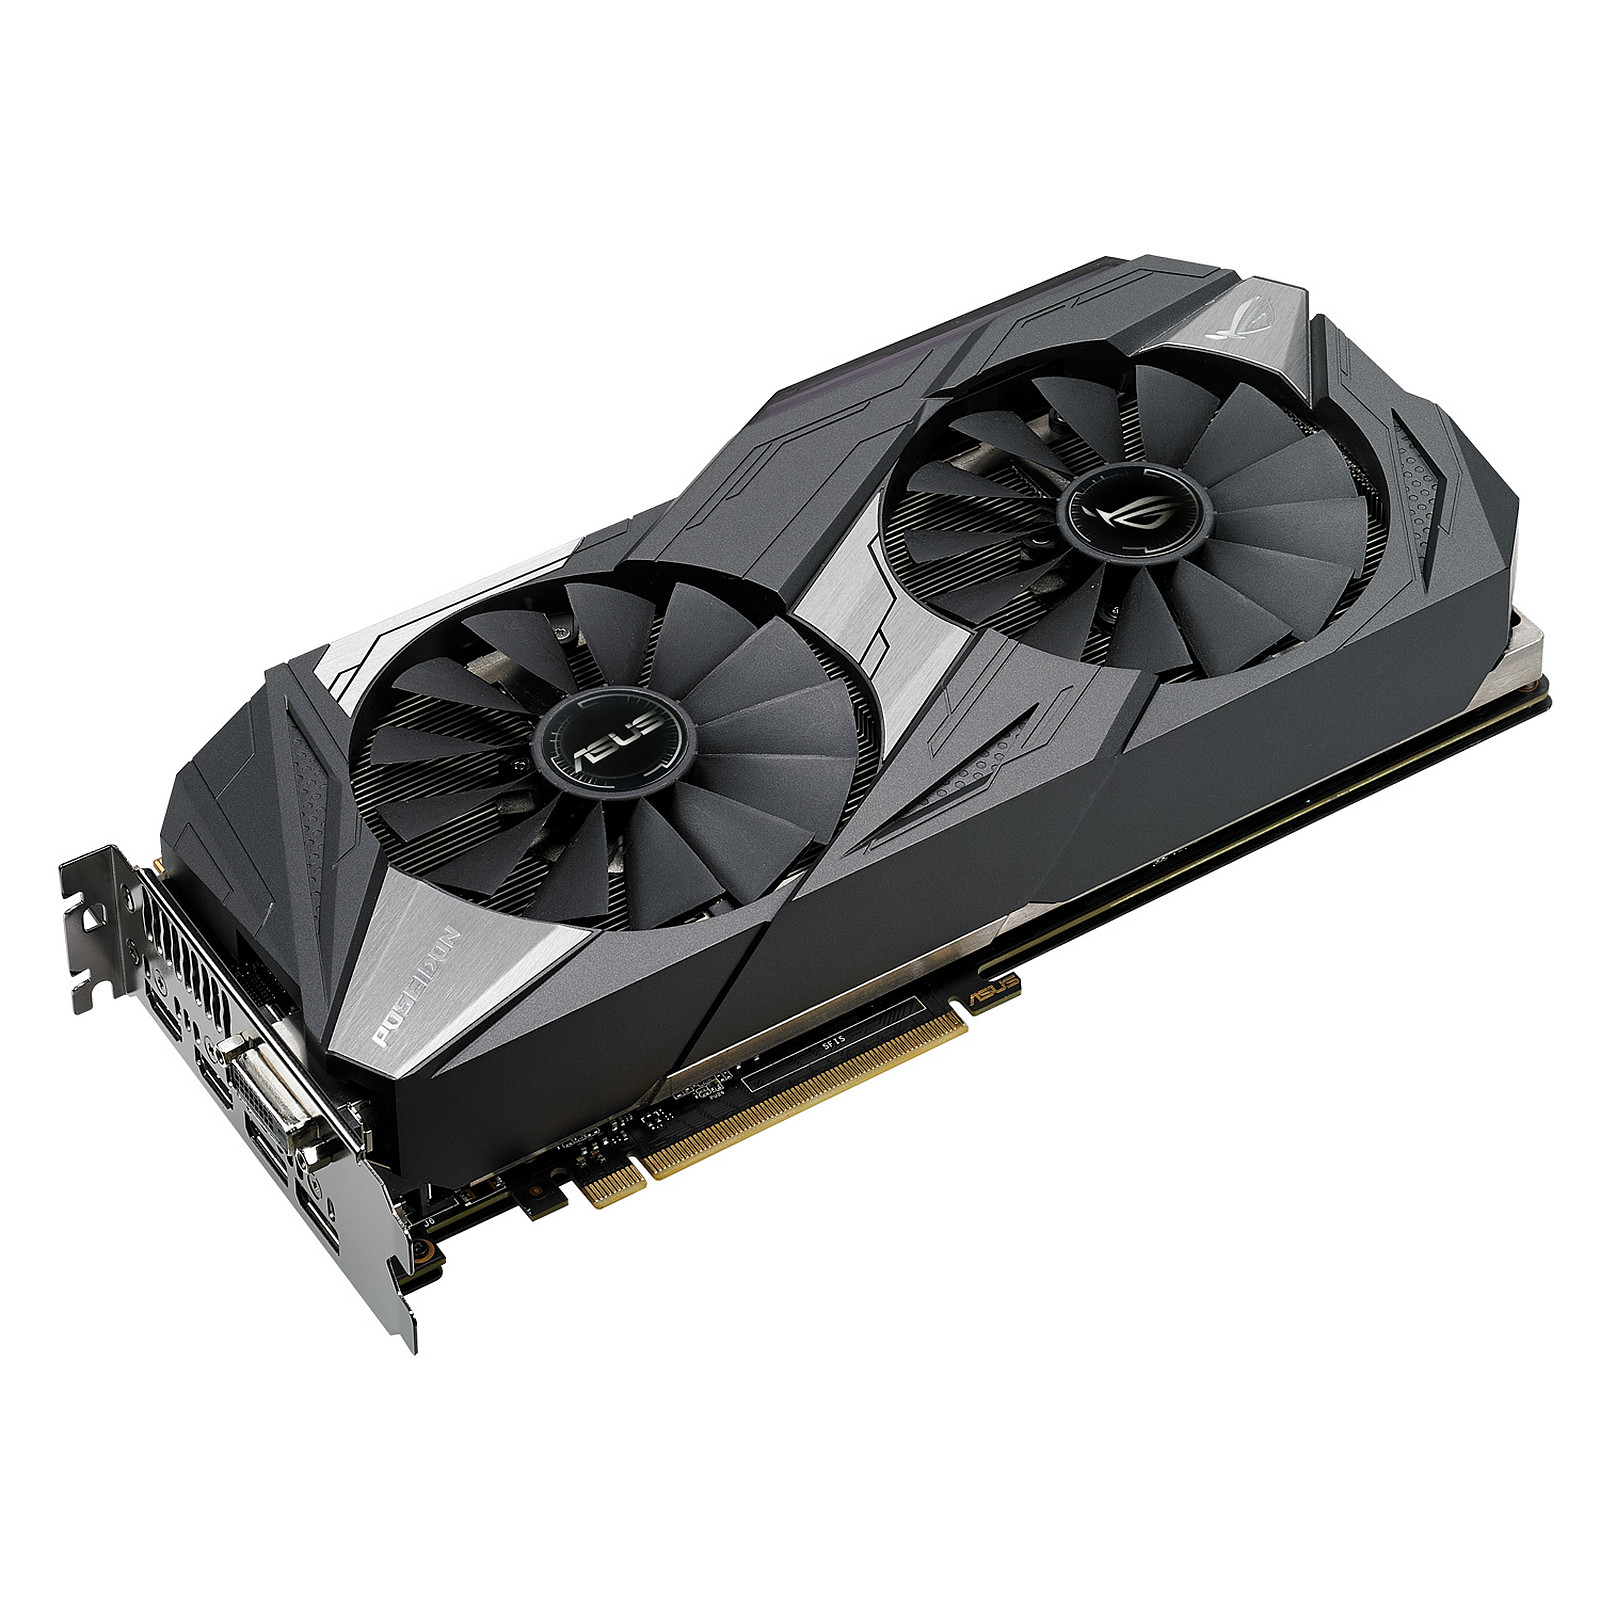 ASUS GeForce GTX 1080 Ti 11 GB ROG-POSEIDON-GTX1080TI-P11G-GAMING